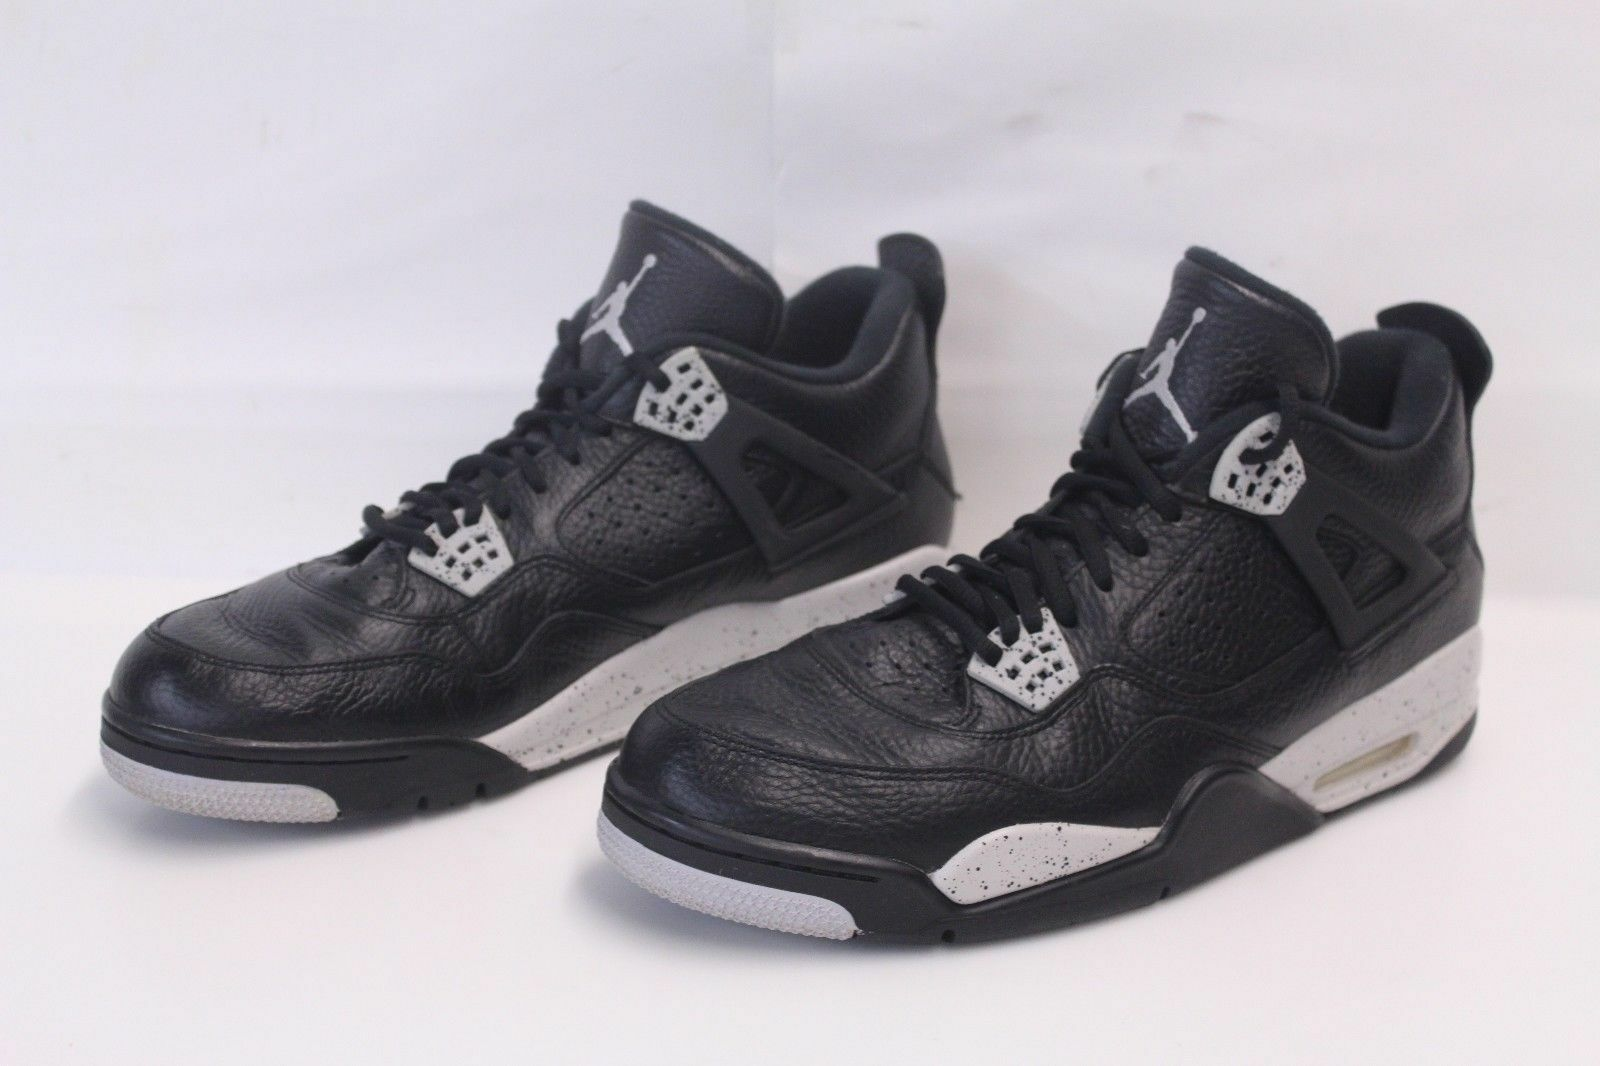 NIKE Air Jordan IV 4 Retro Oreo Black/Grey Cement 314254-003 US Men's Size 13